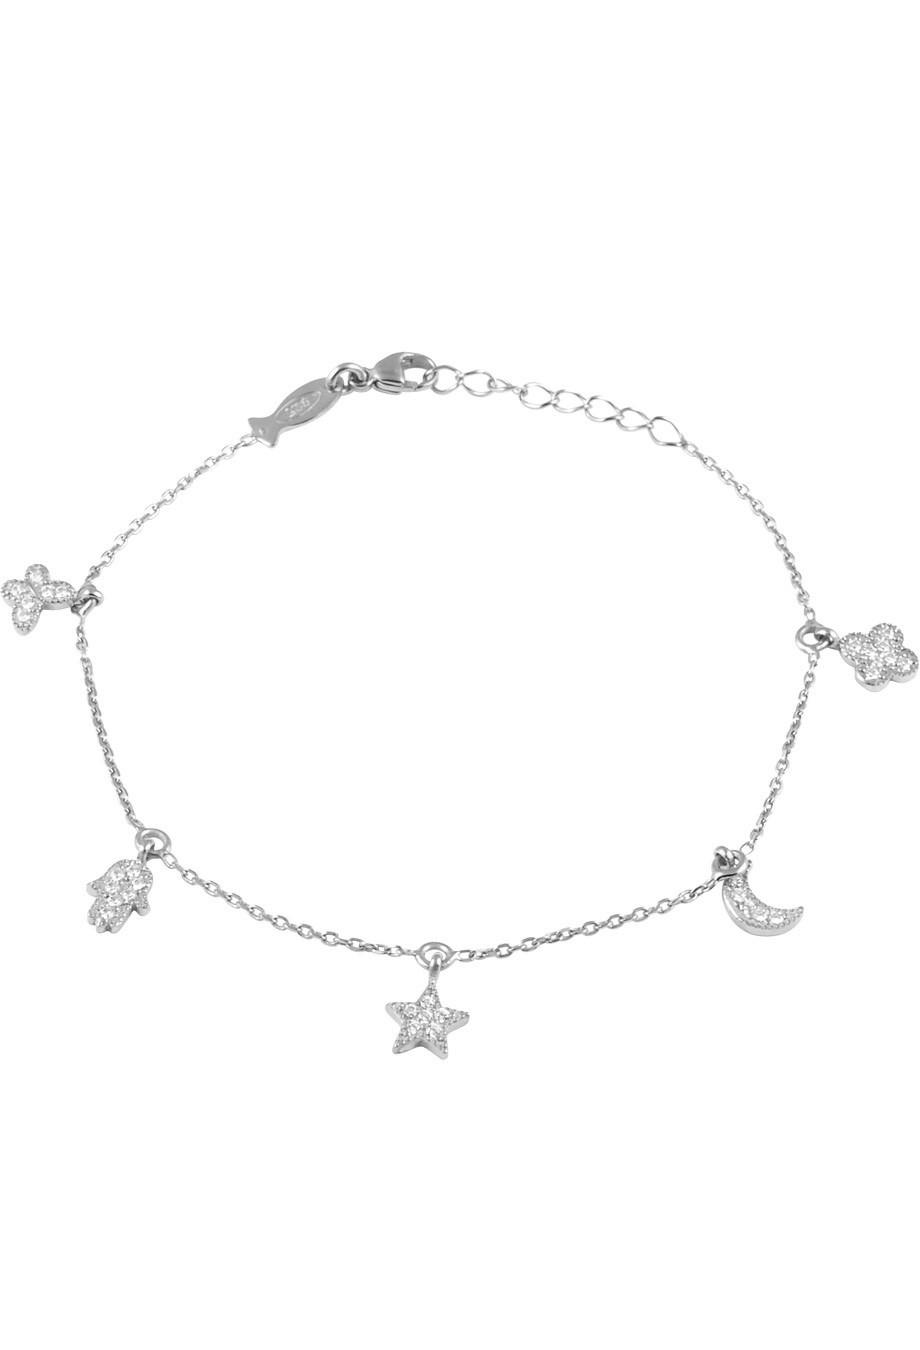 b1ed3282a3 Armband  Amulett  silber von Kurshuni